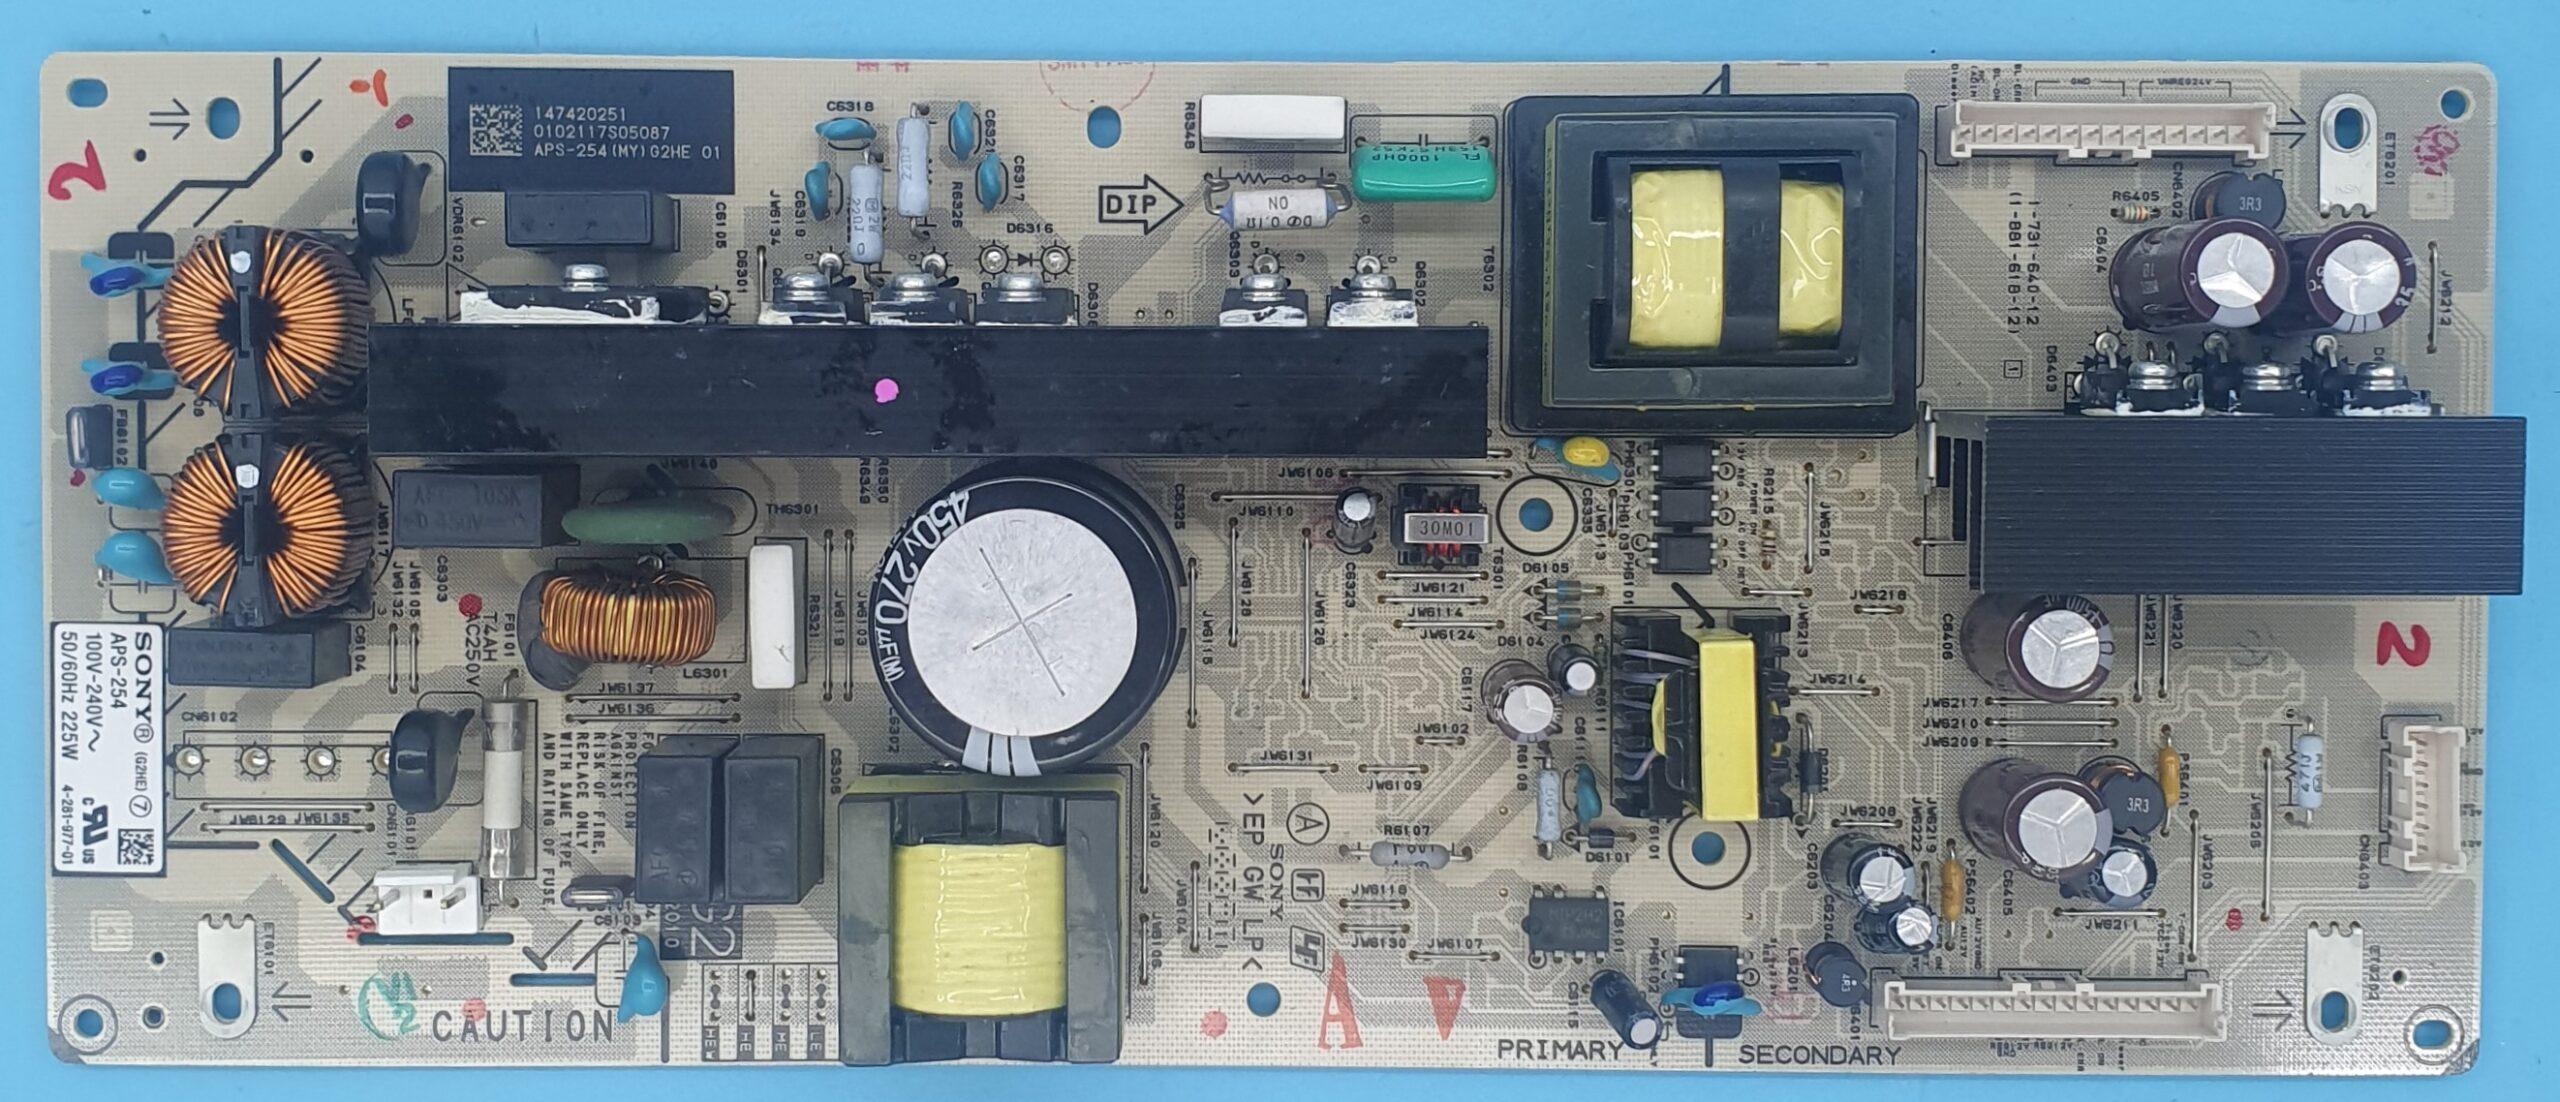 APS-254,147420251 Sony Power (KDV DAHİL = 130 TL)